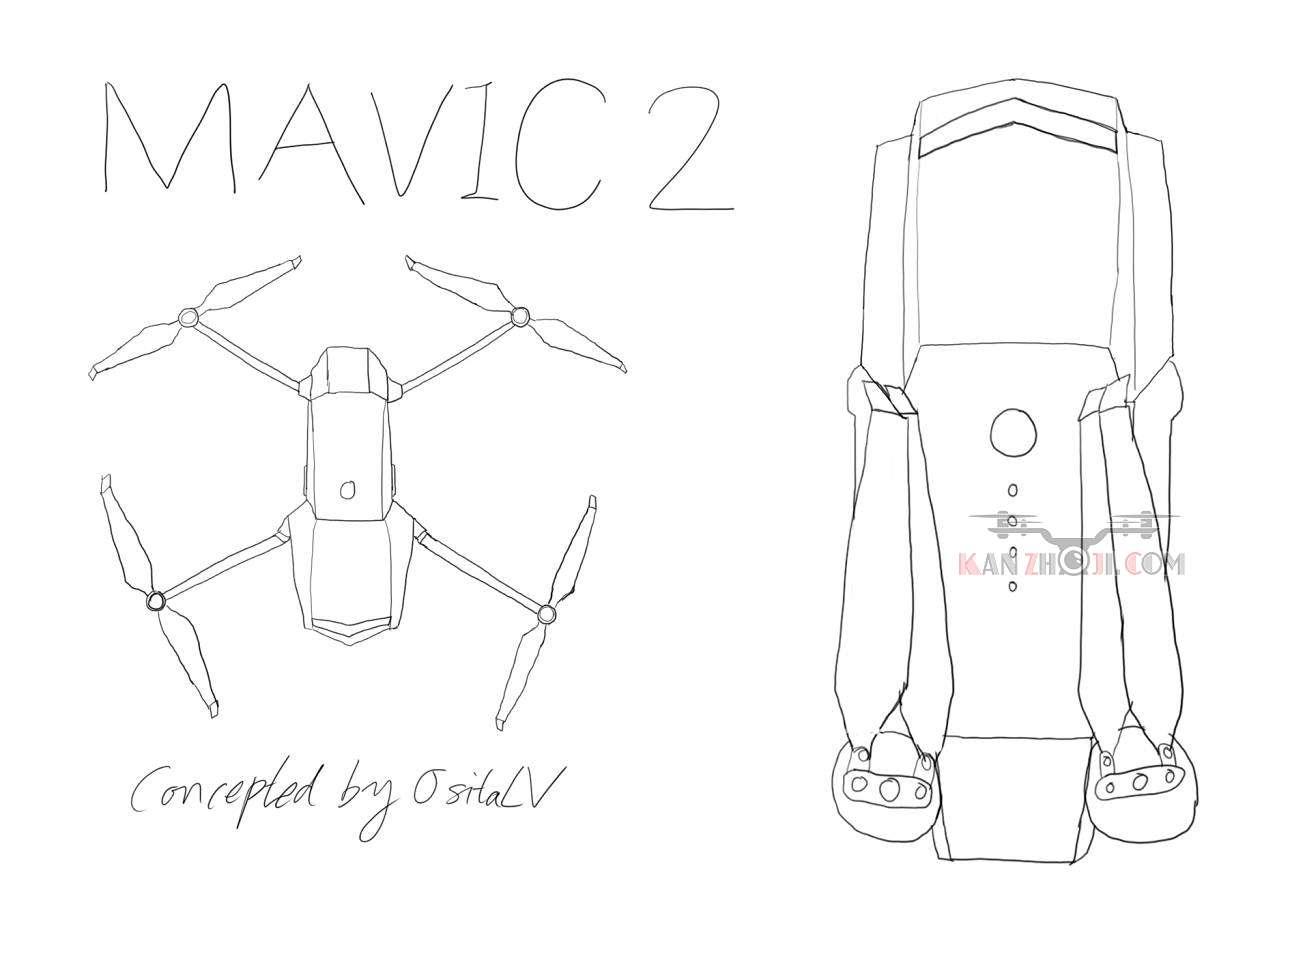 mavicpro2-rumor.jpg